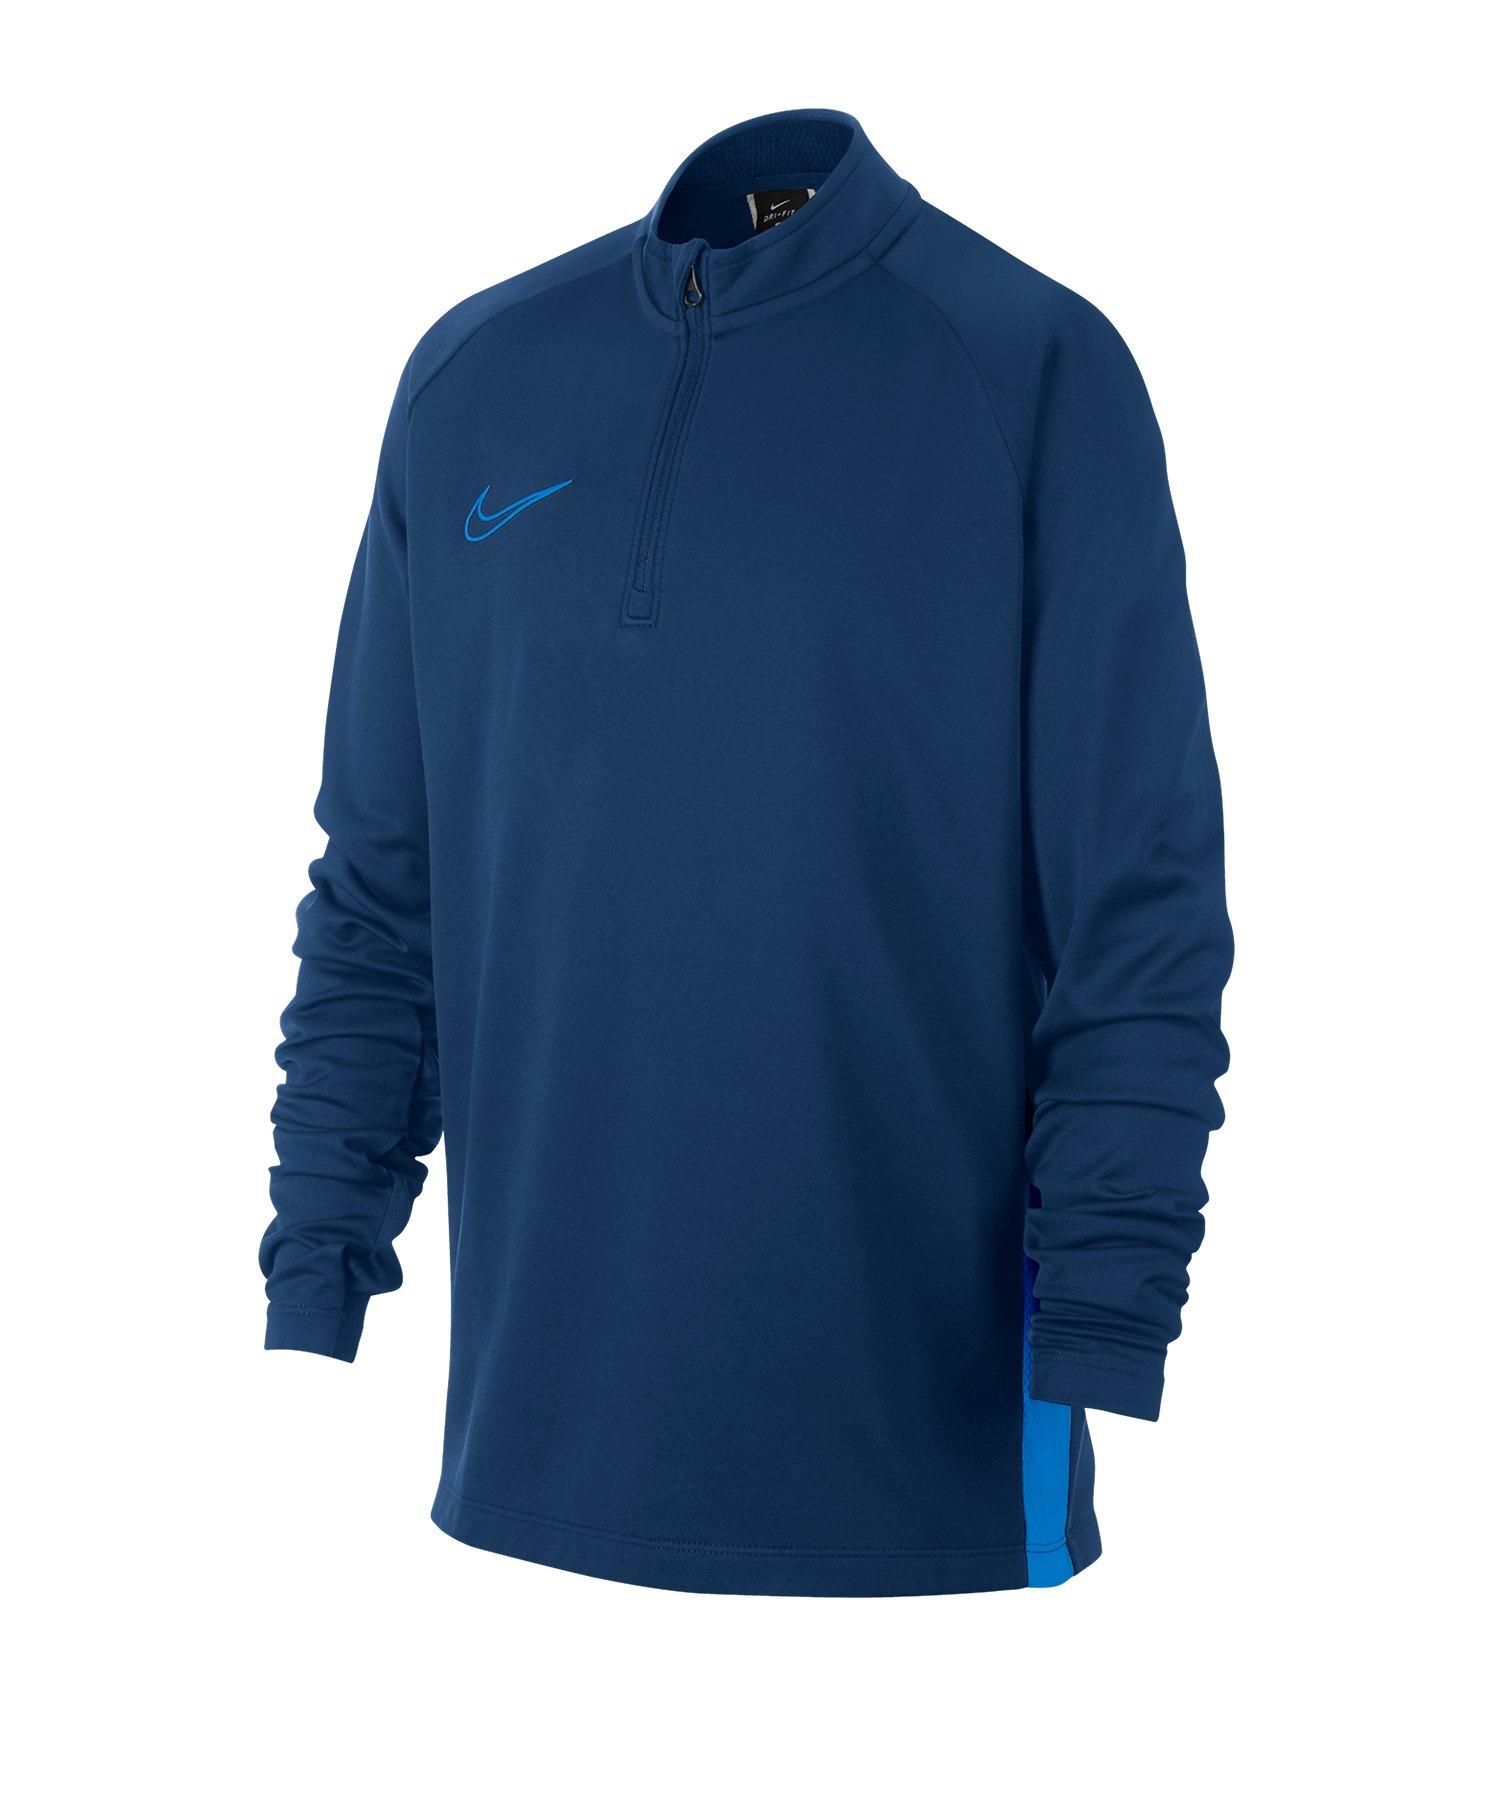 Nike Dry Academy Drill Top Kids Blau F407 - blau